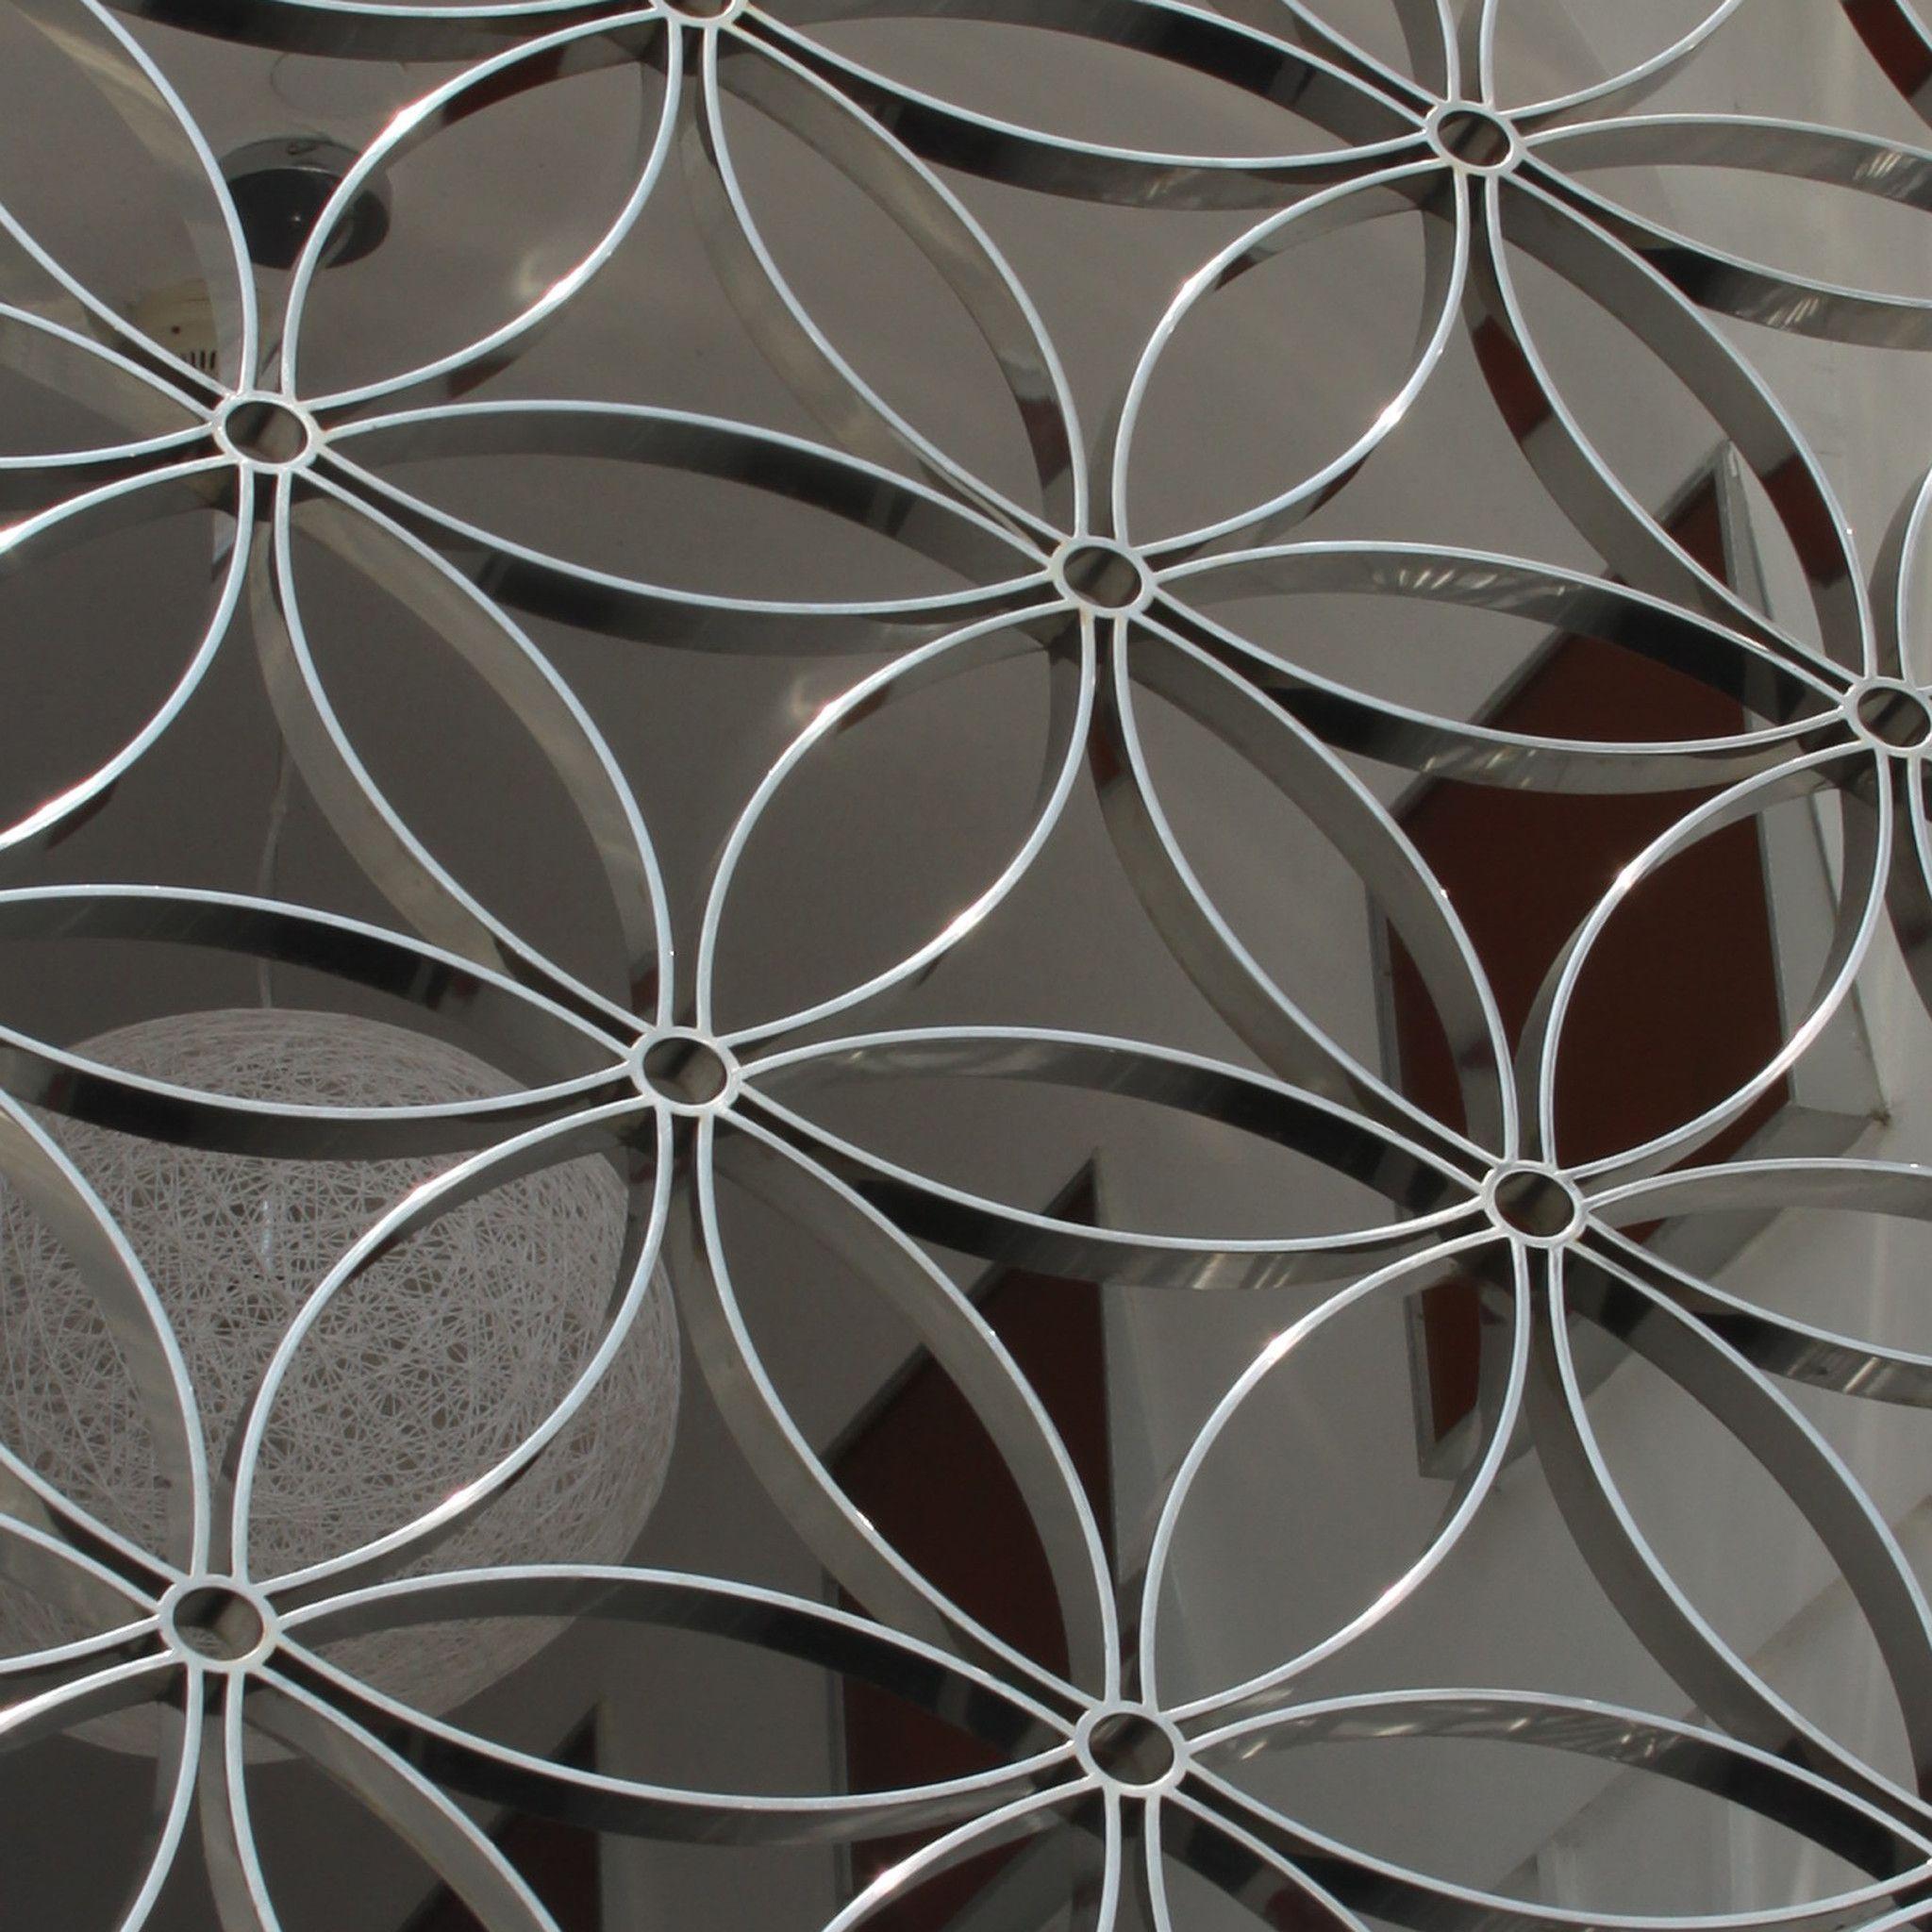 Decorative Panels & Screens